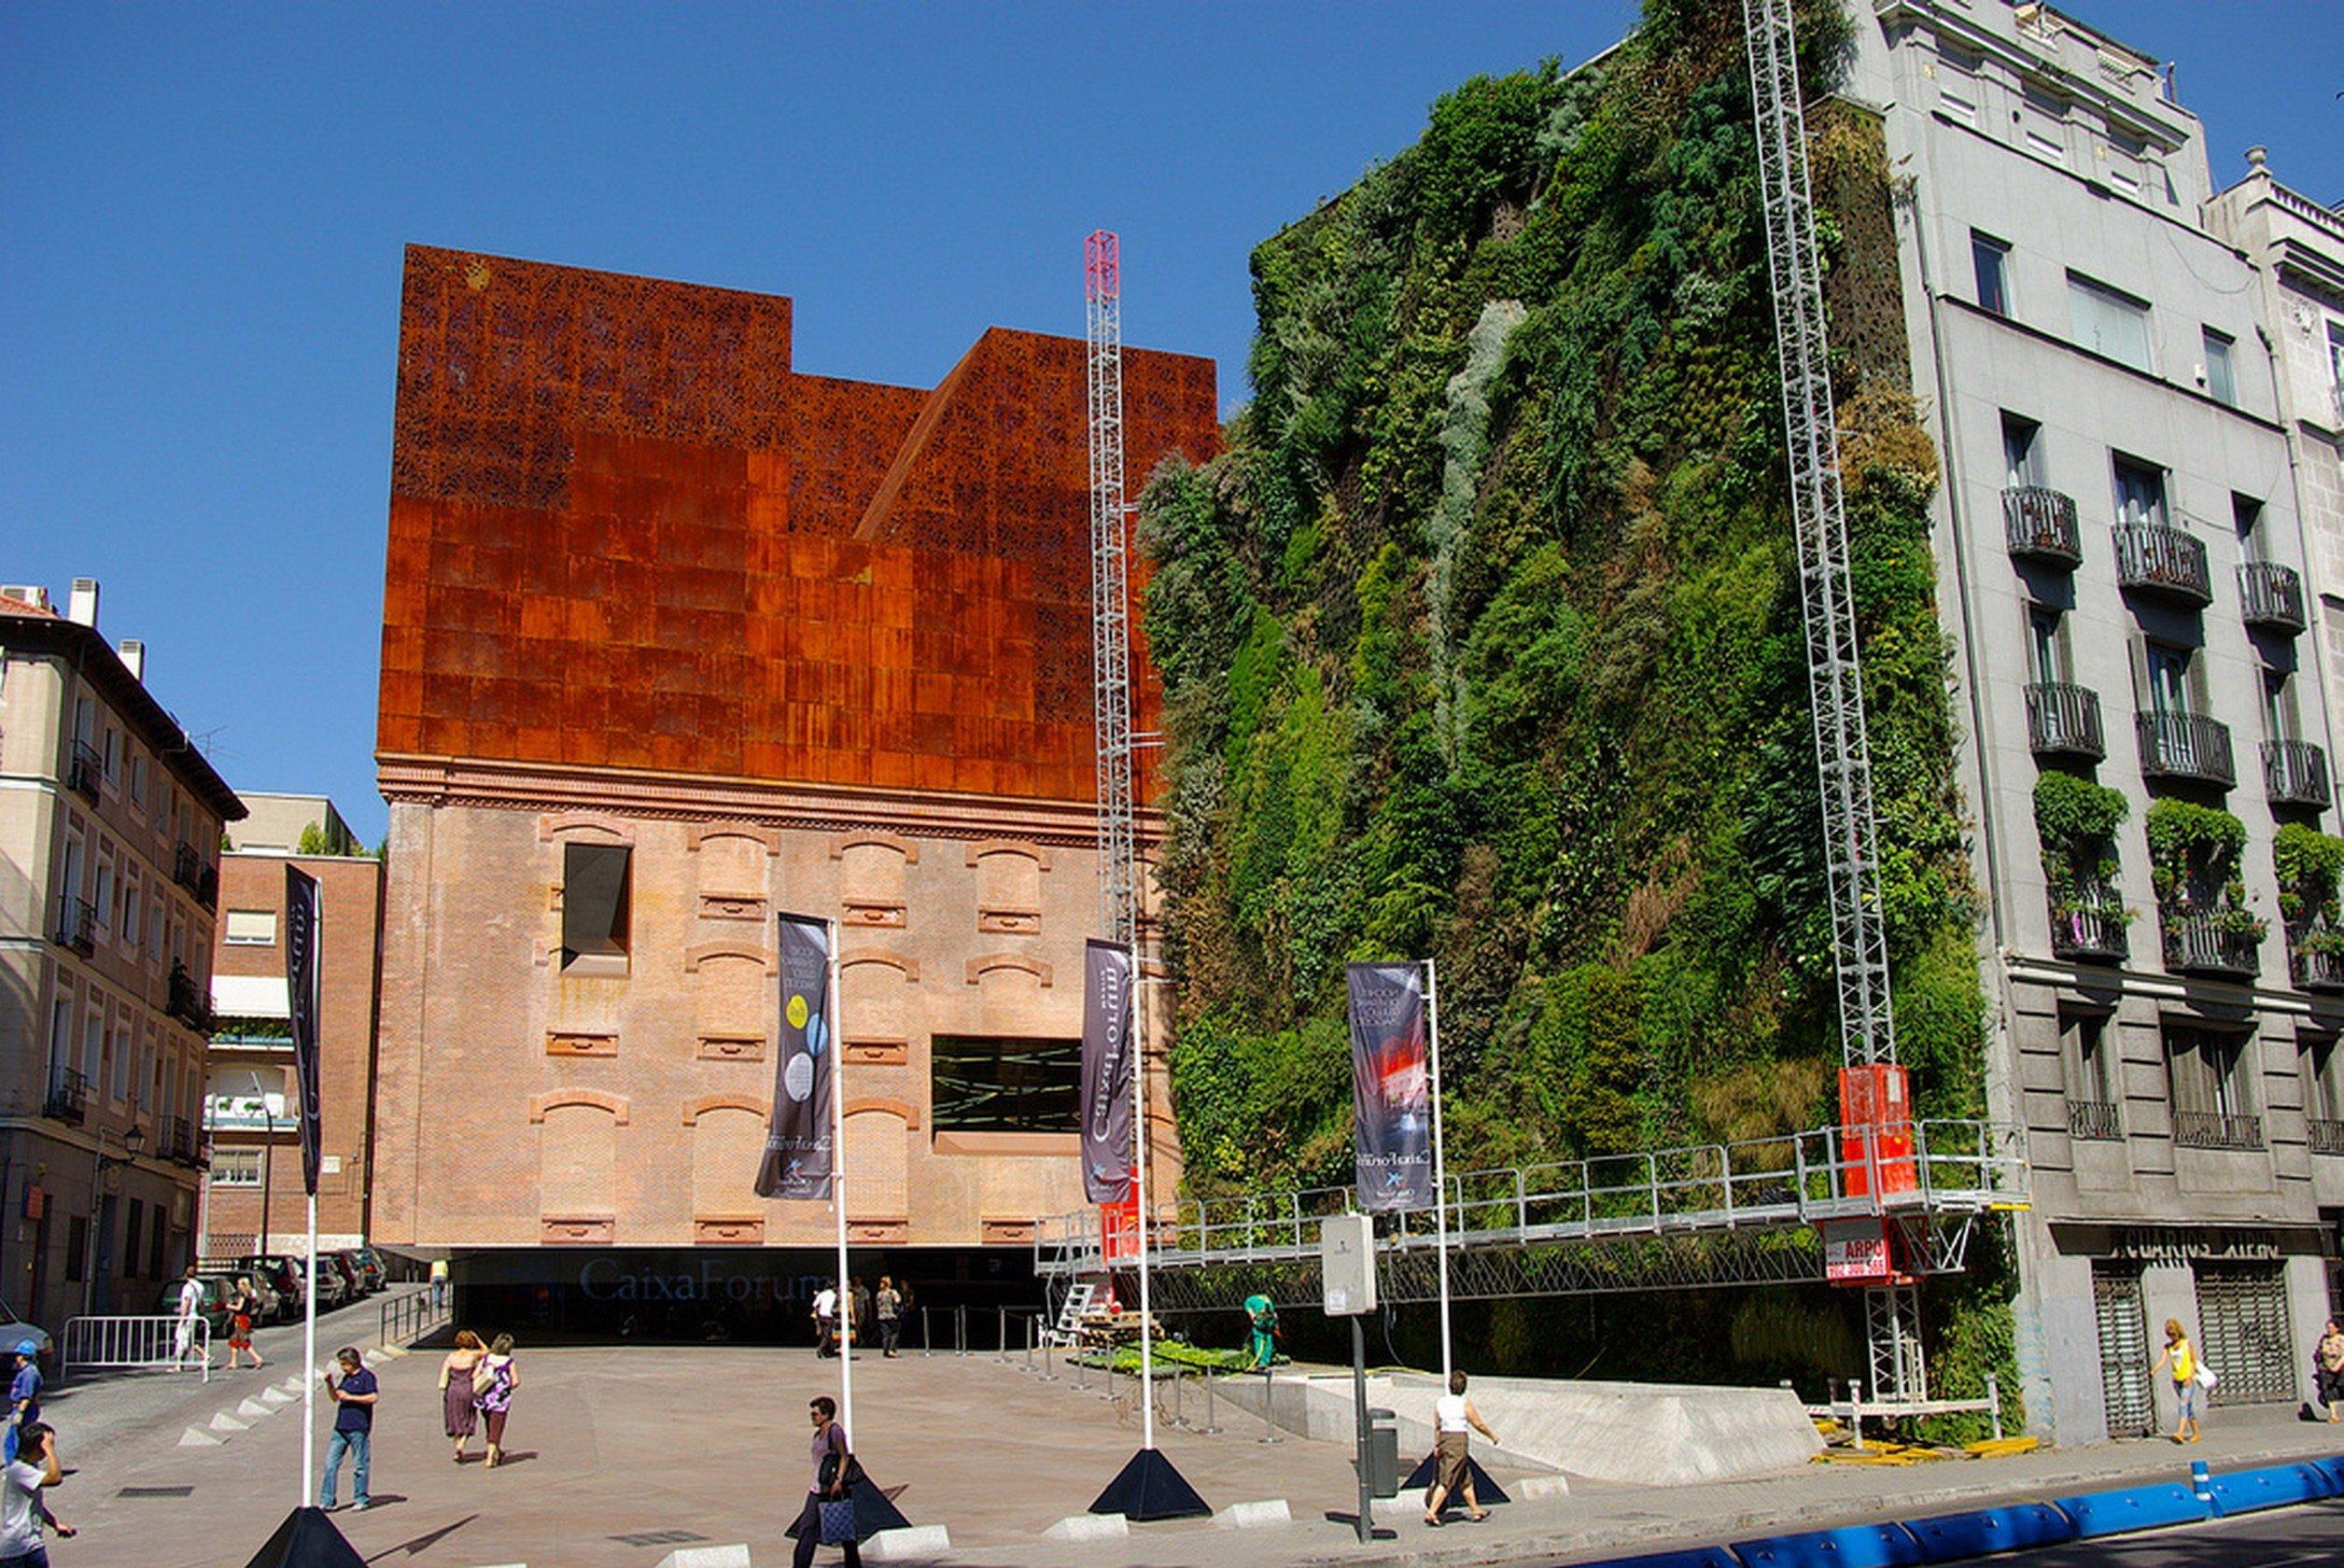 Architettura A Madrid caixa forum madrid   herzog & de meuron